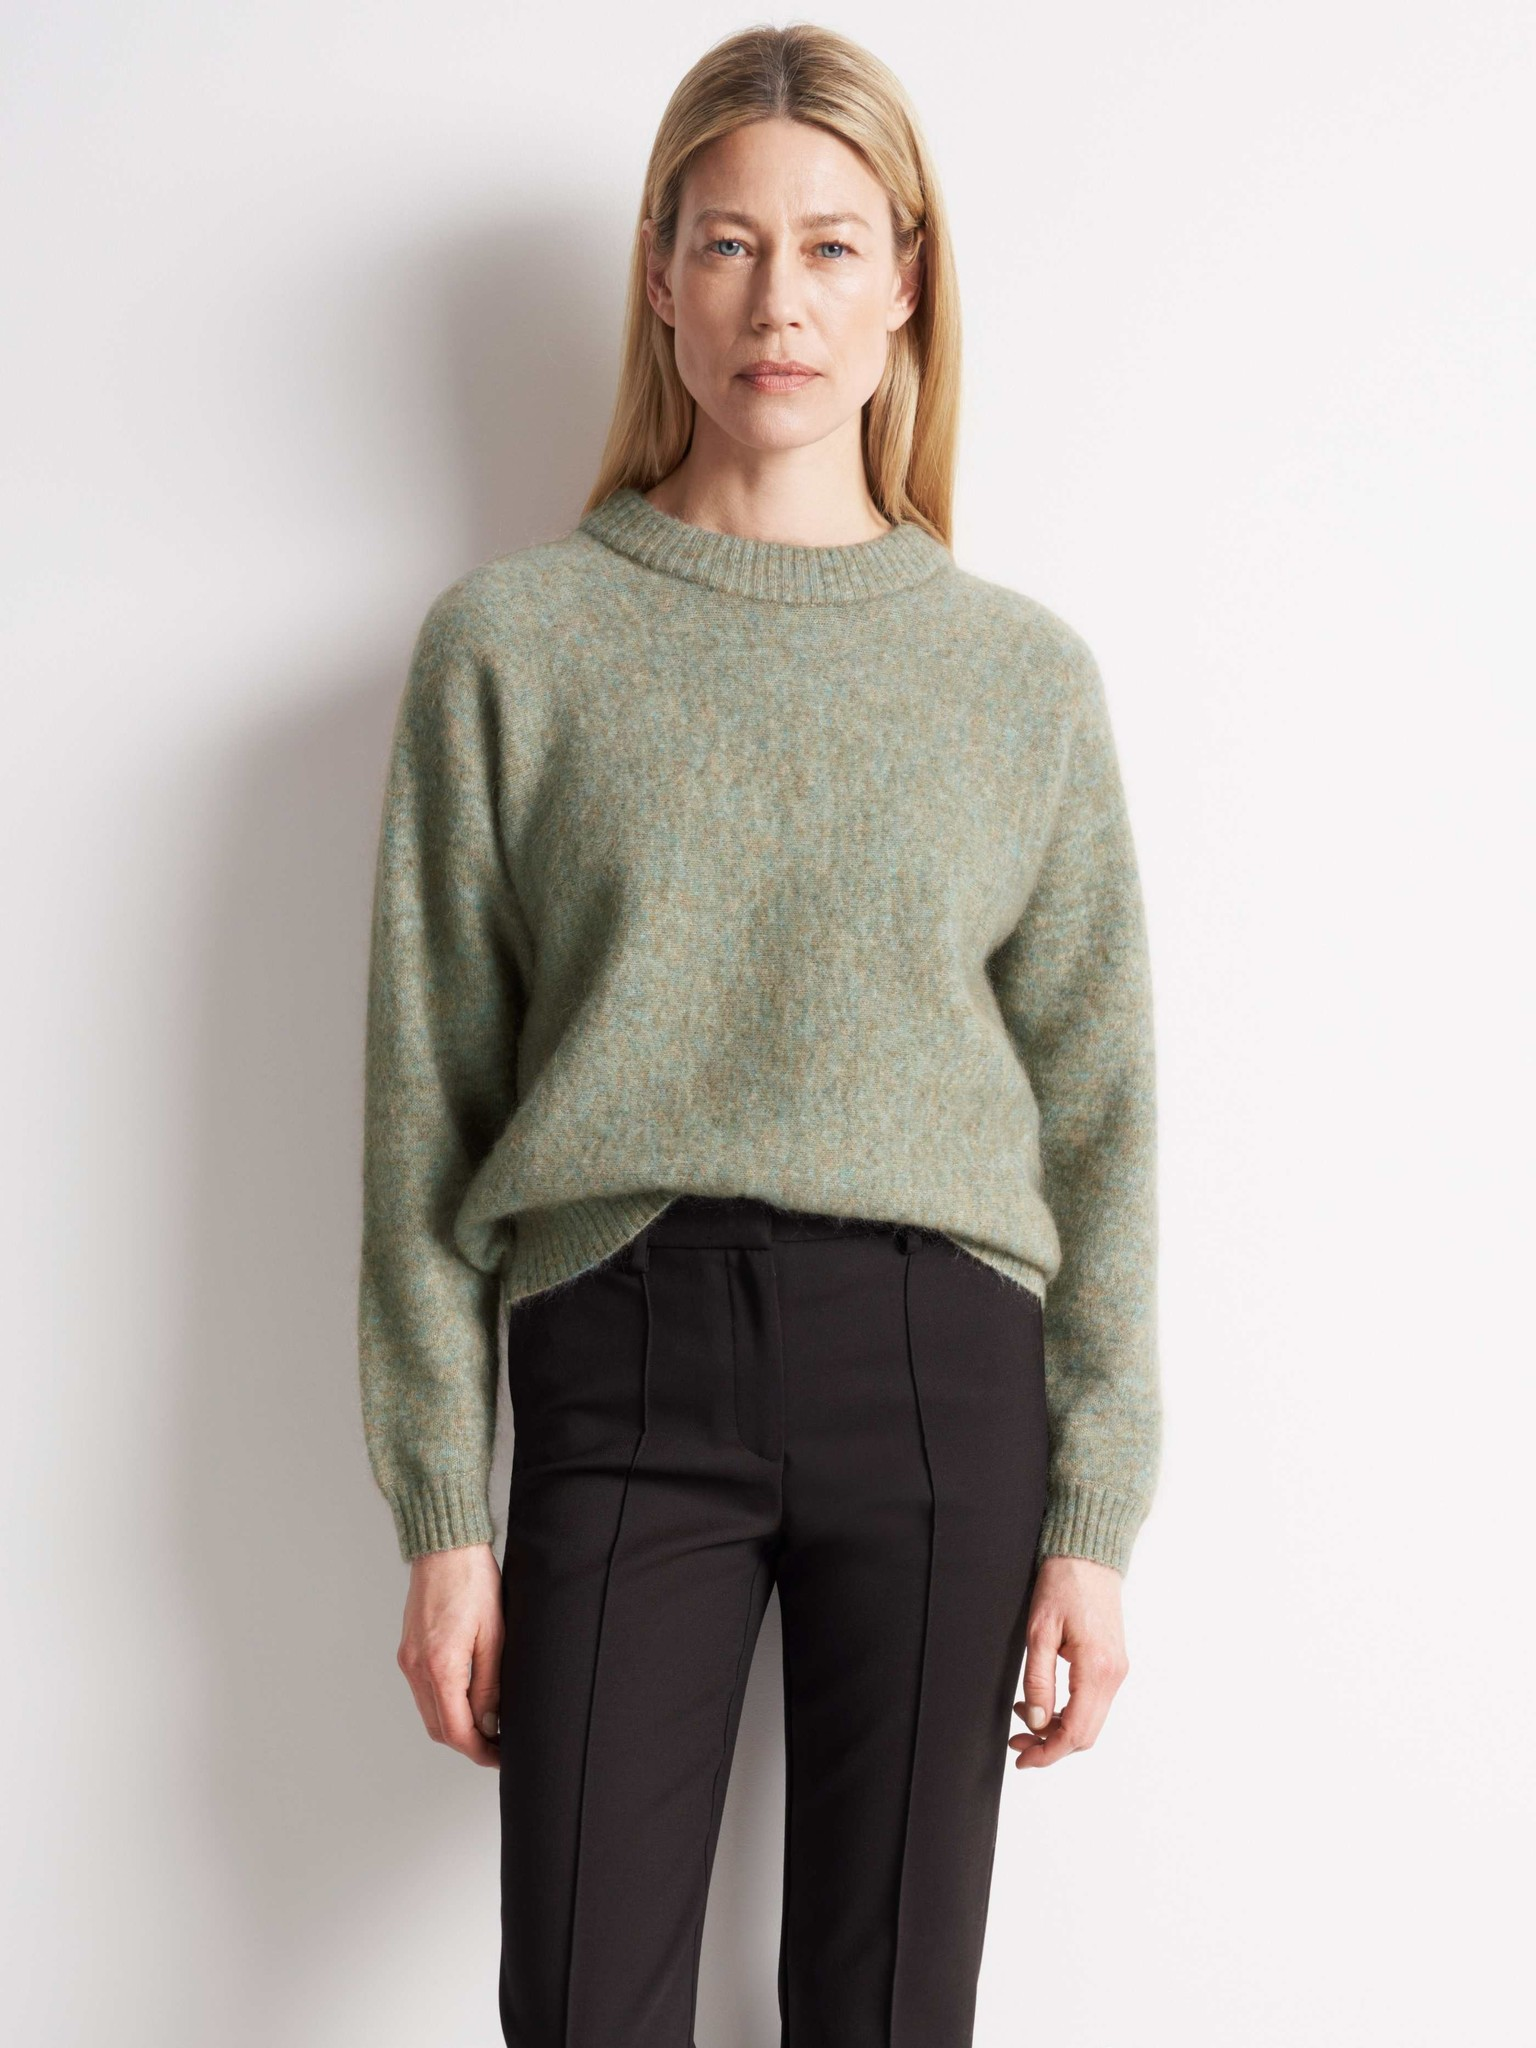 Gwynn Pale Jade Green Wool Knitwear-1